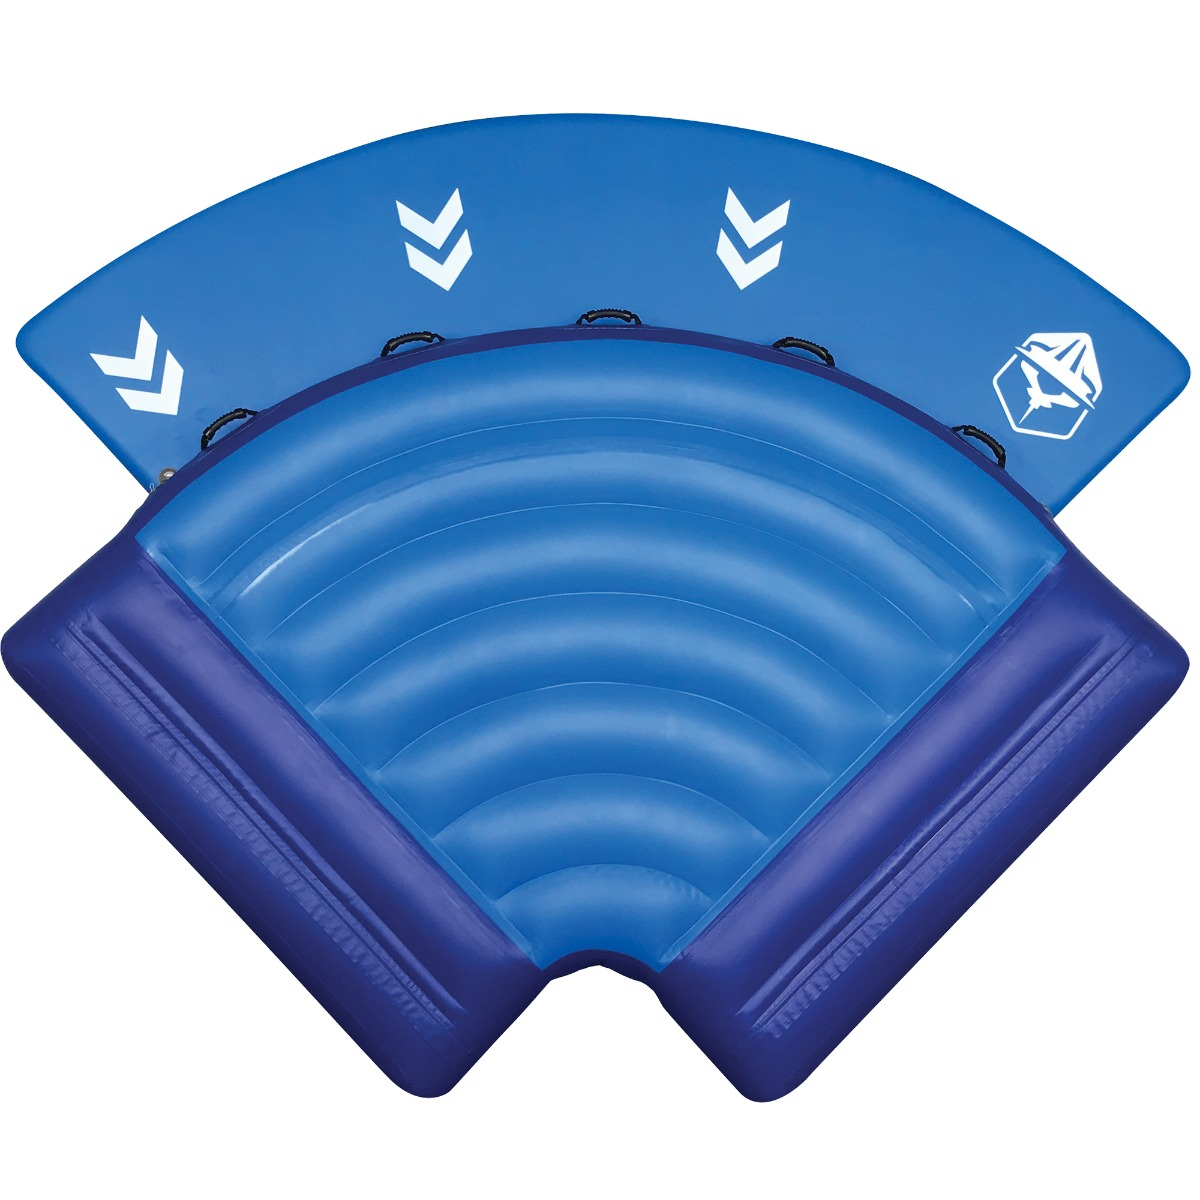 User Manual: Union Aquaparks Mulligan